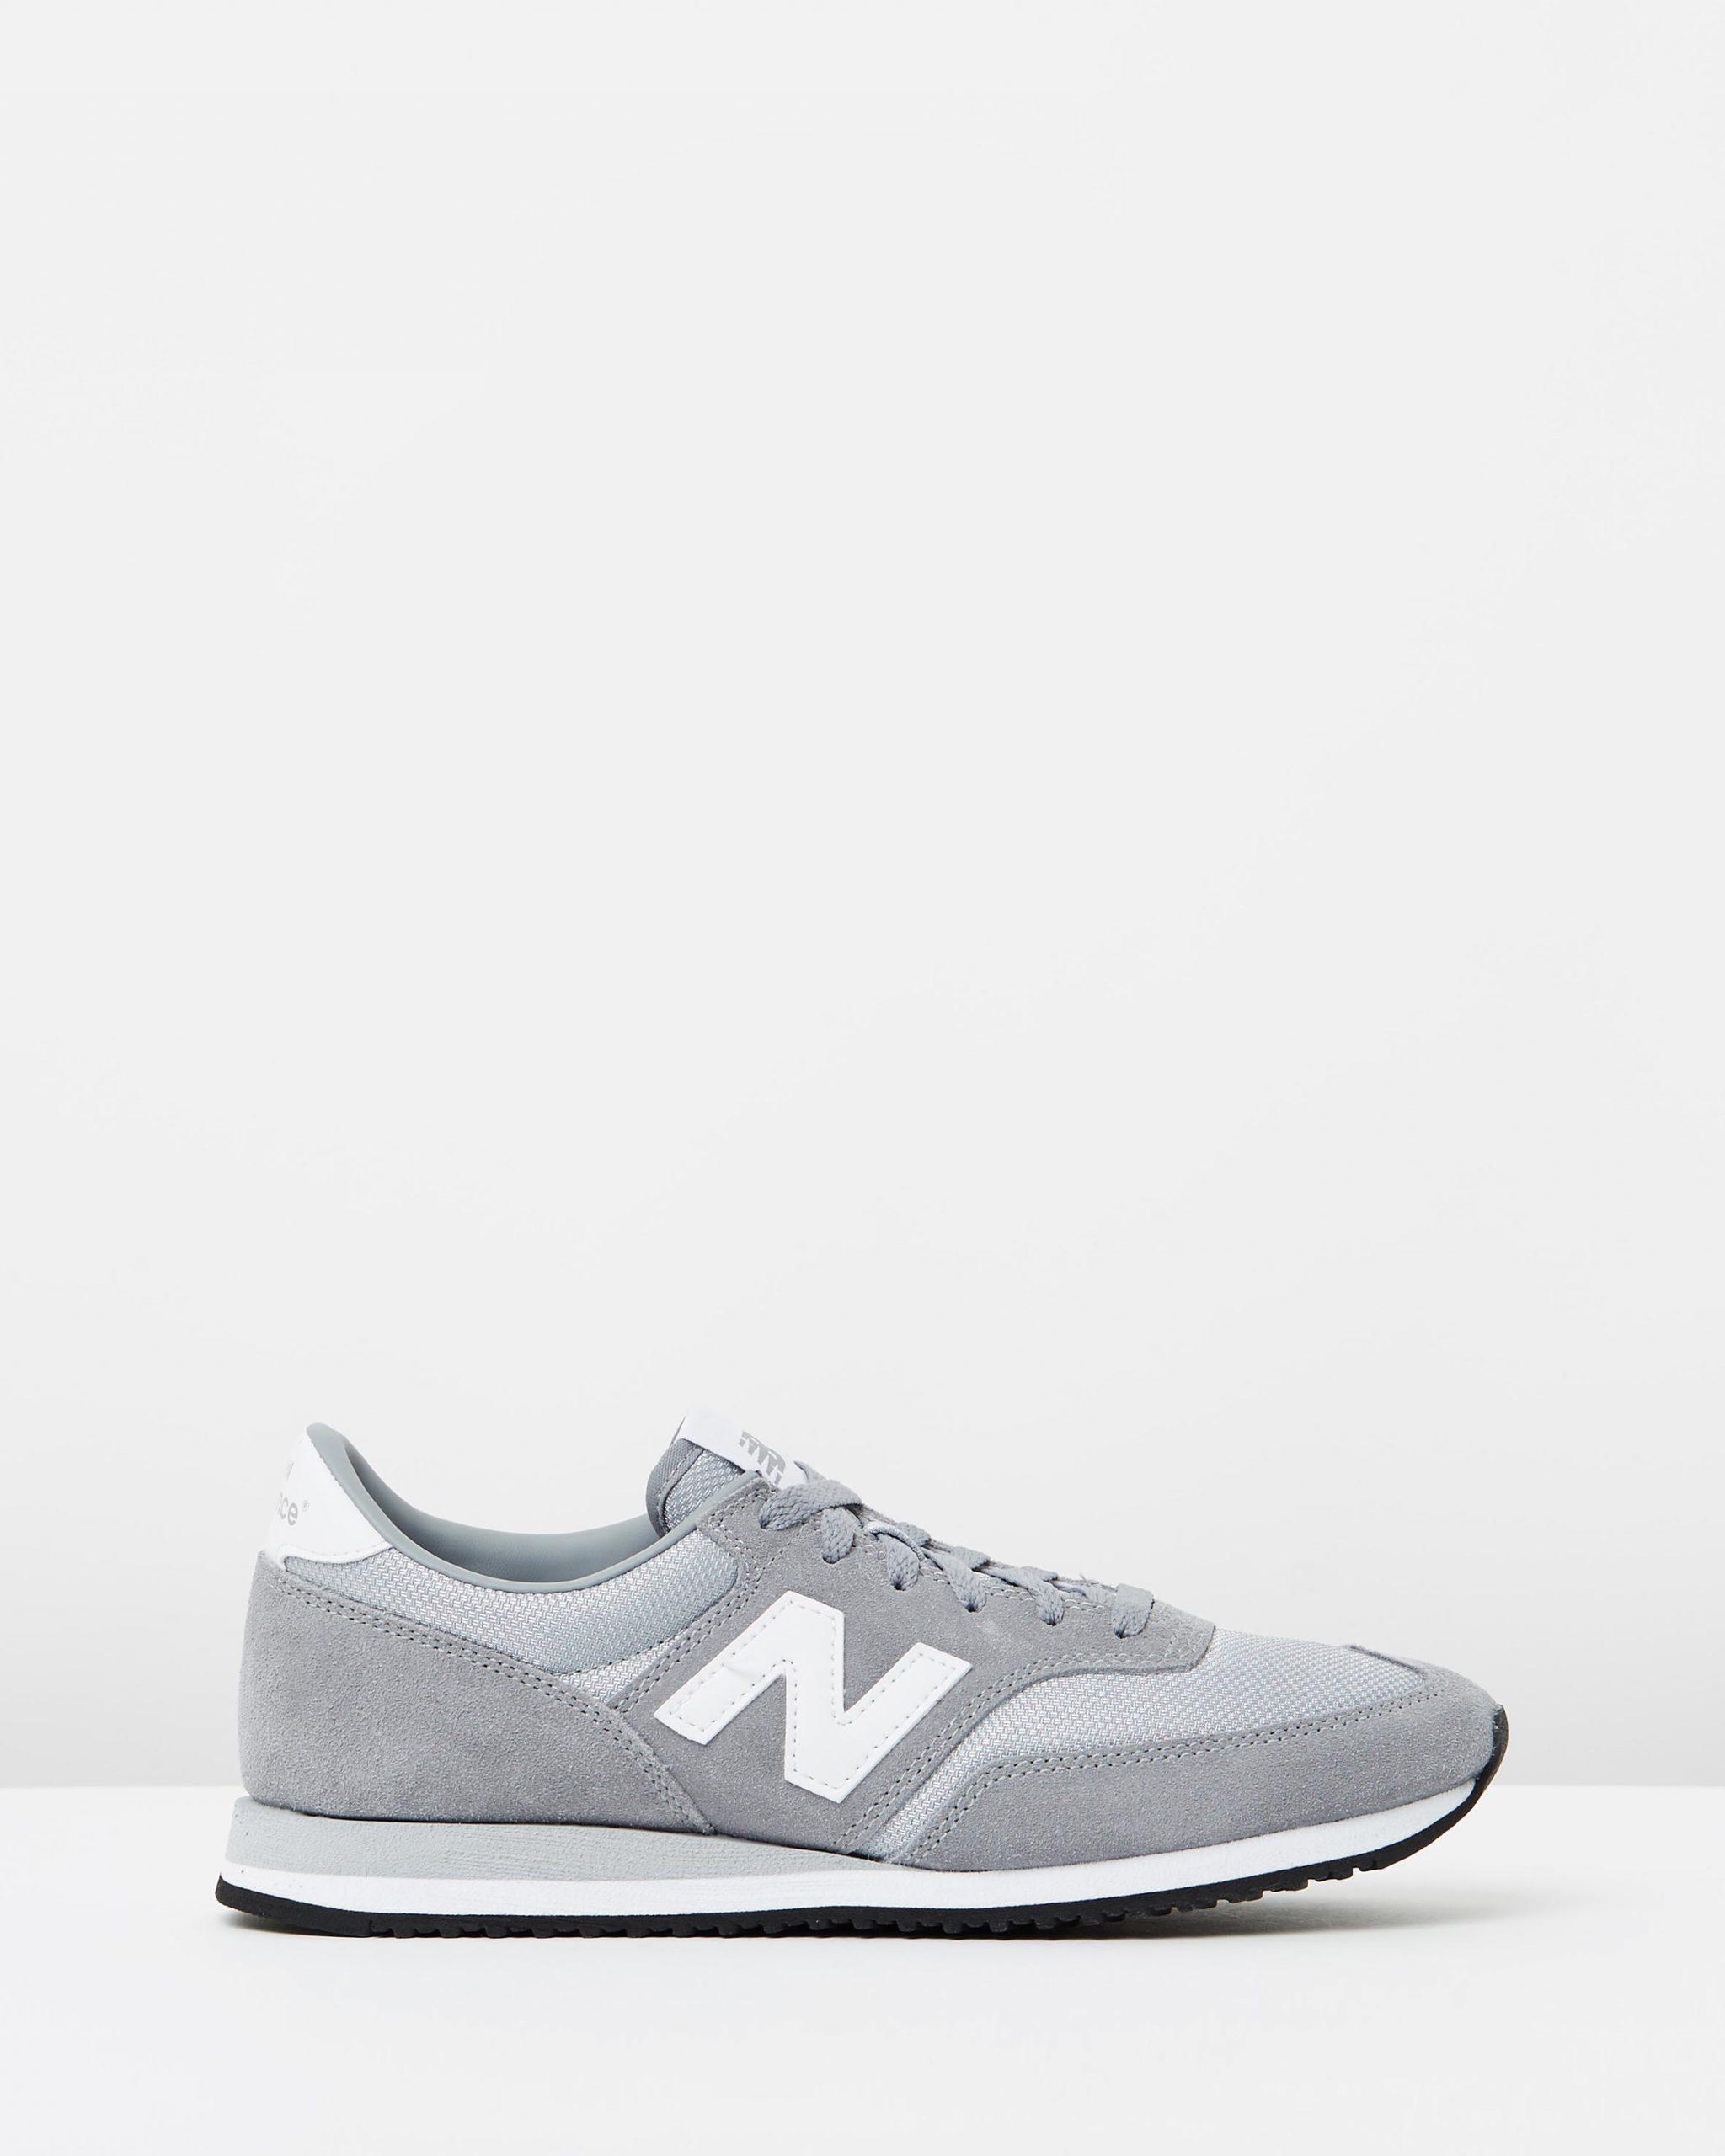 New Balance Classics 620 Grey